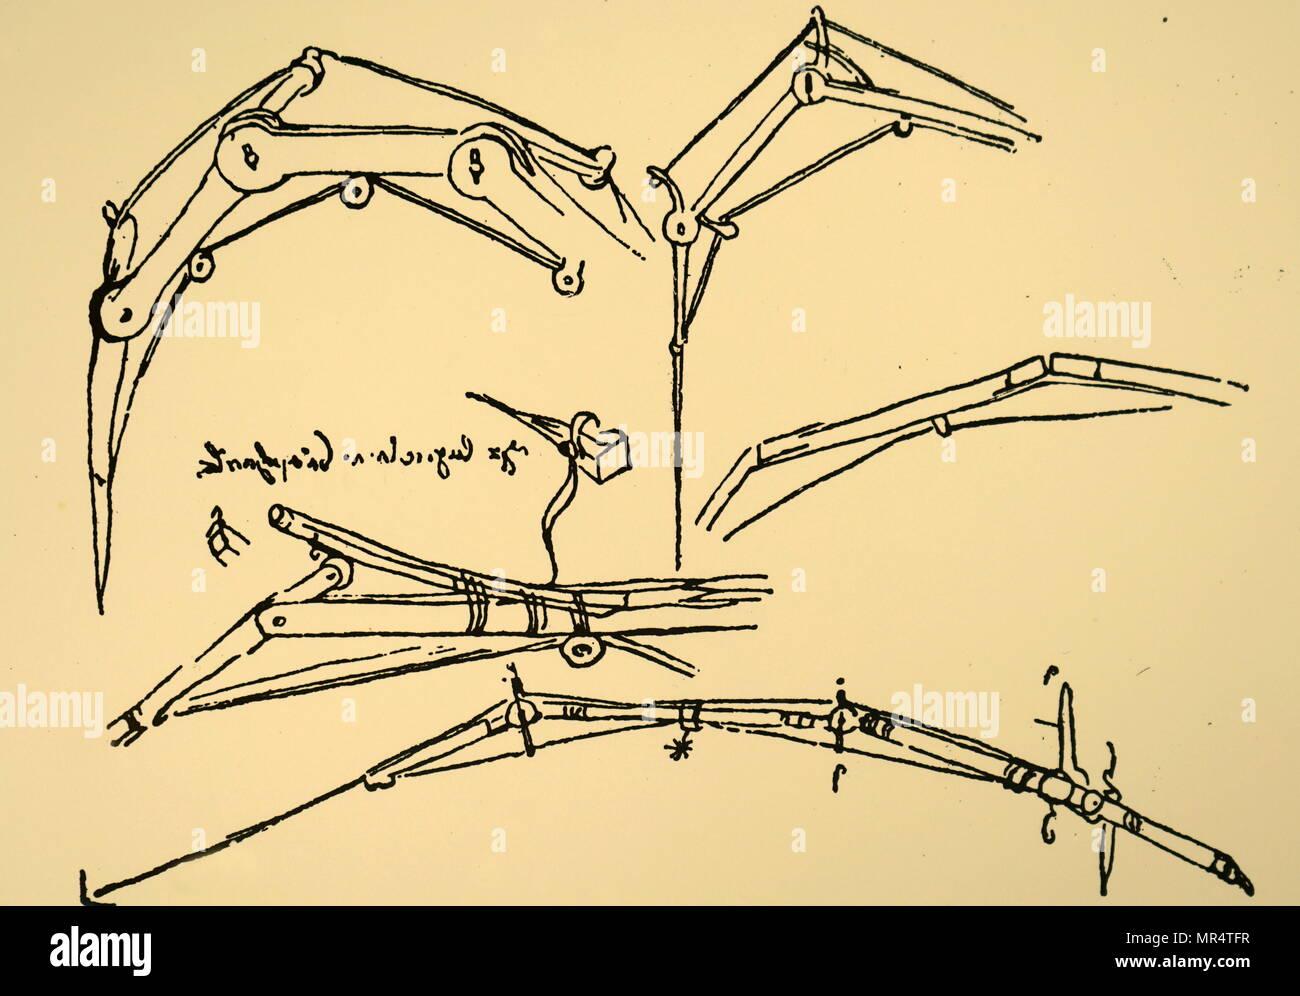 Leonardo Da Vinci Anatomy Stock Photos & Leonardo Da Vinci Anatomy ...